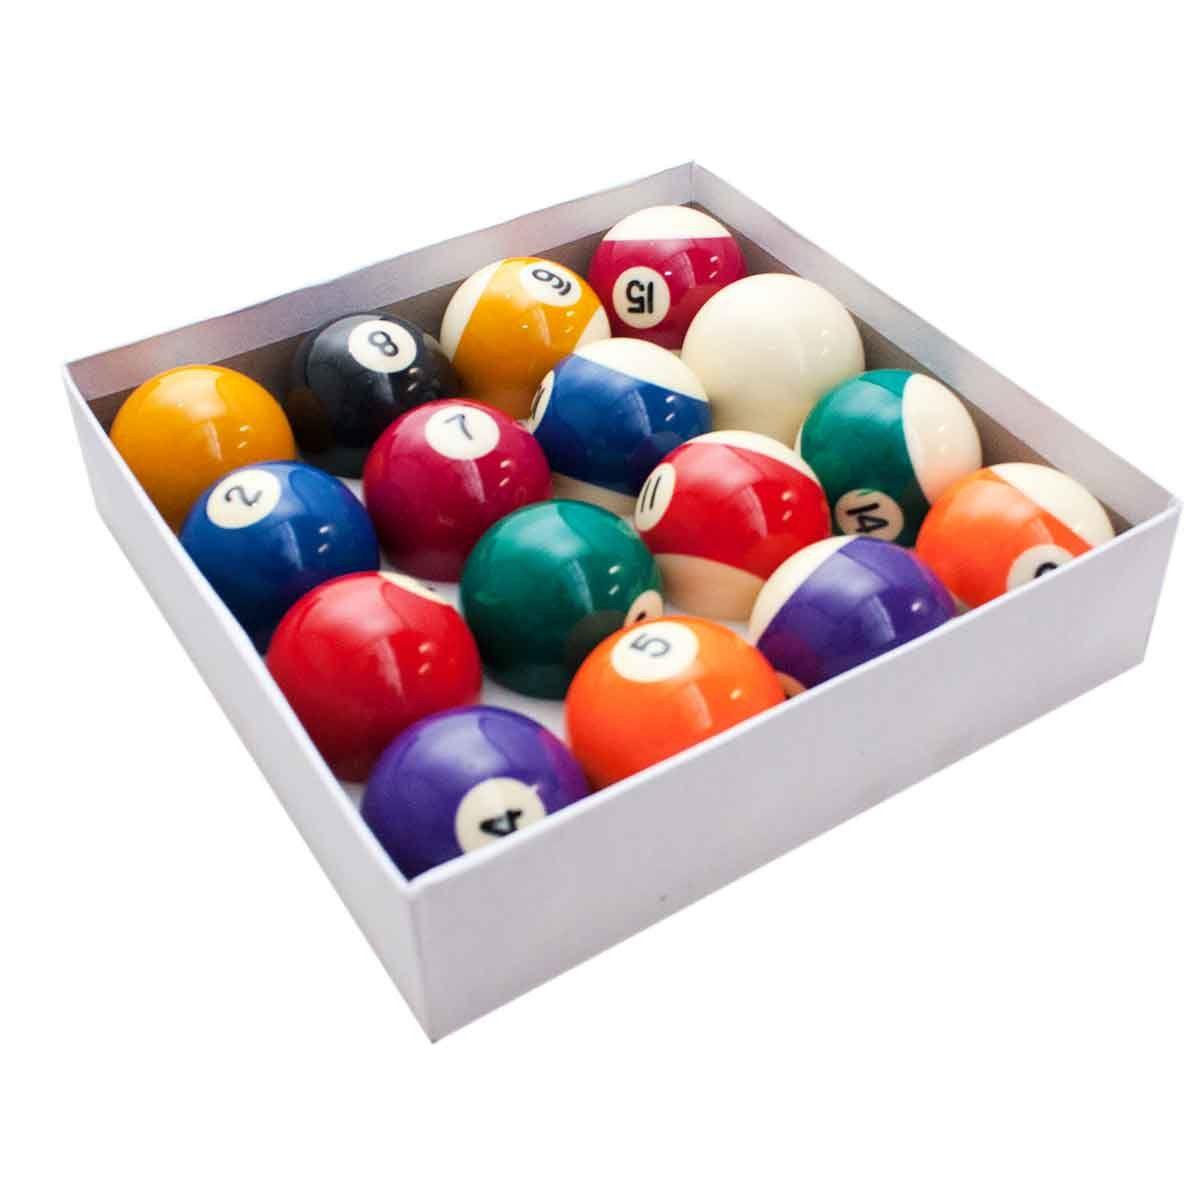 Bola Bilhar Snooker Sinuca 16 Bolas 57-60mm Jogo Numeradas